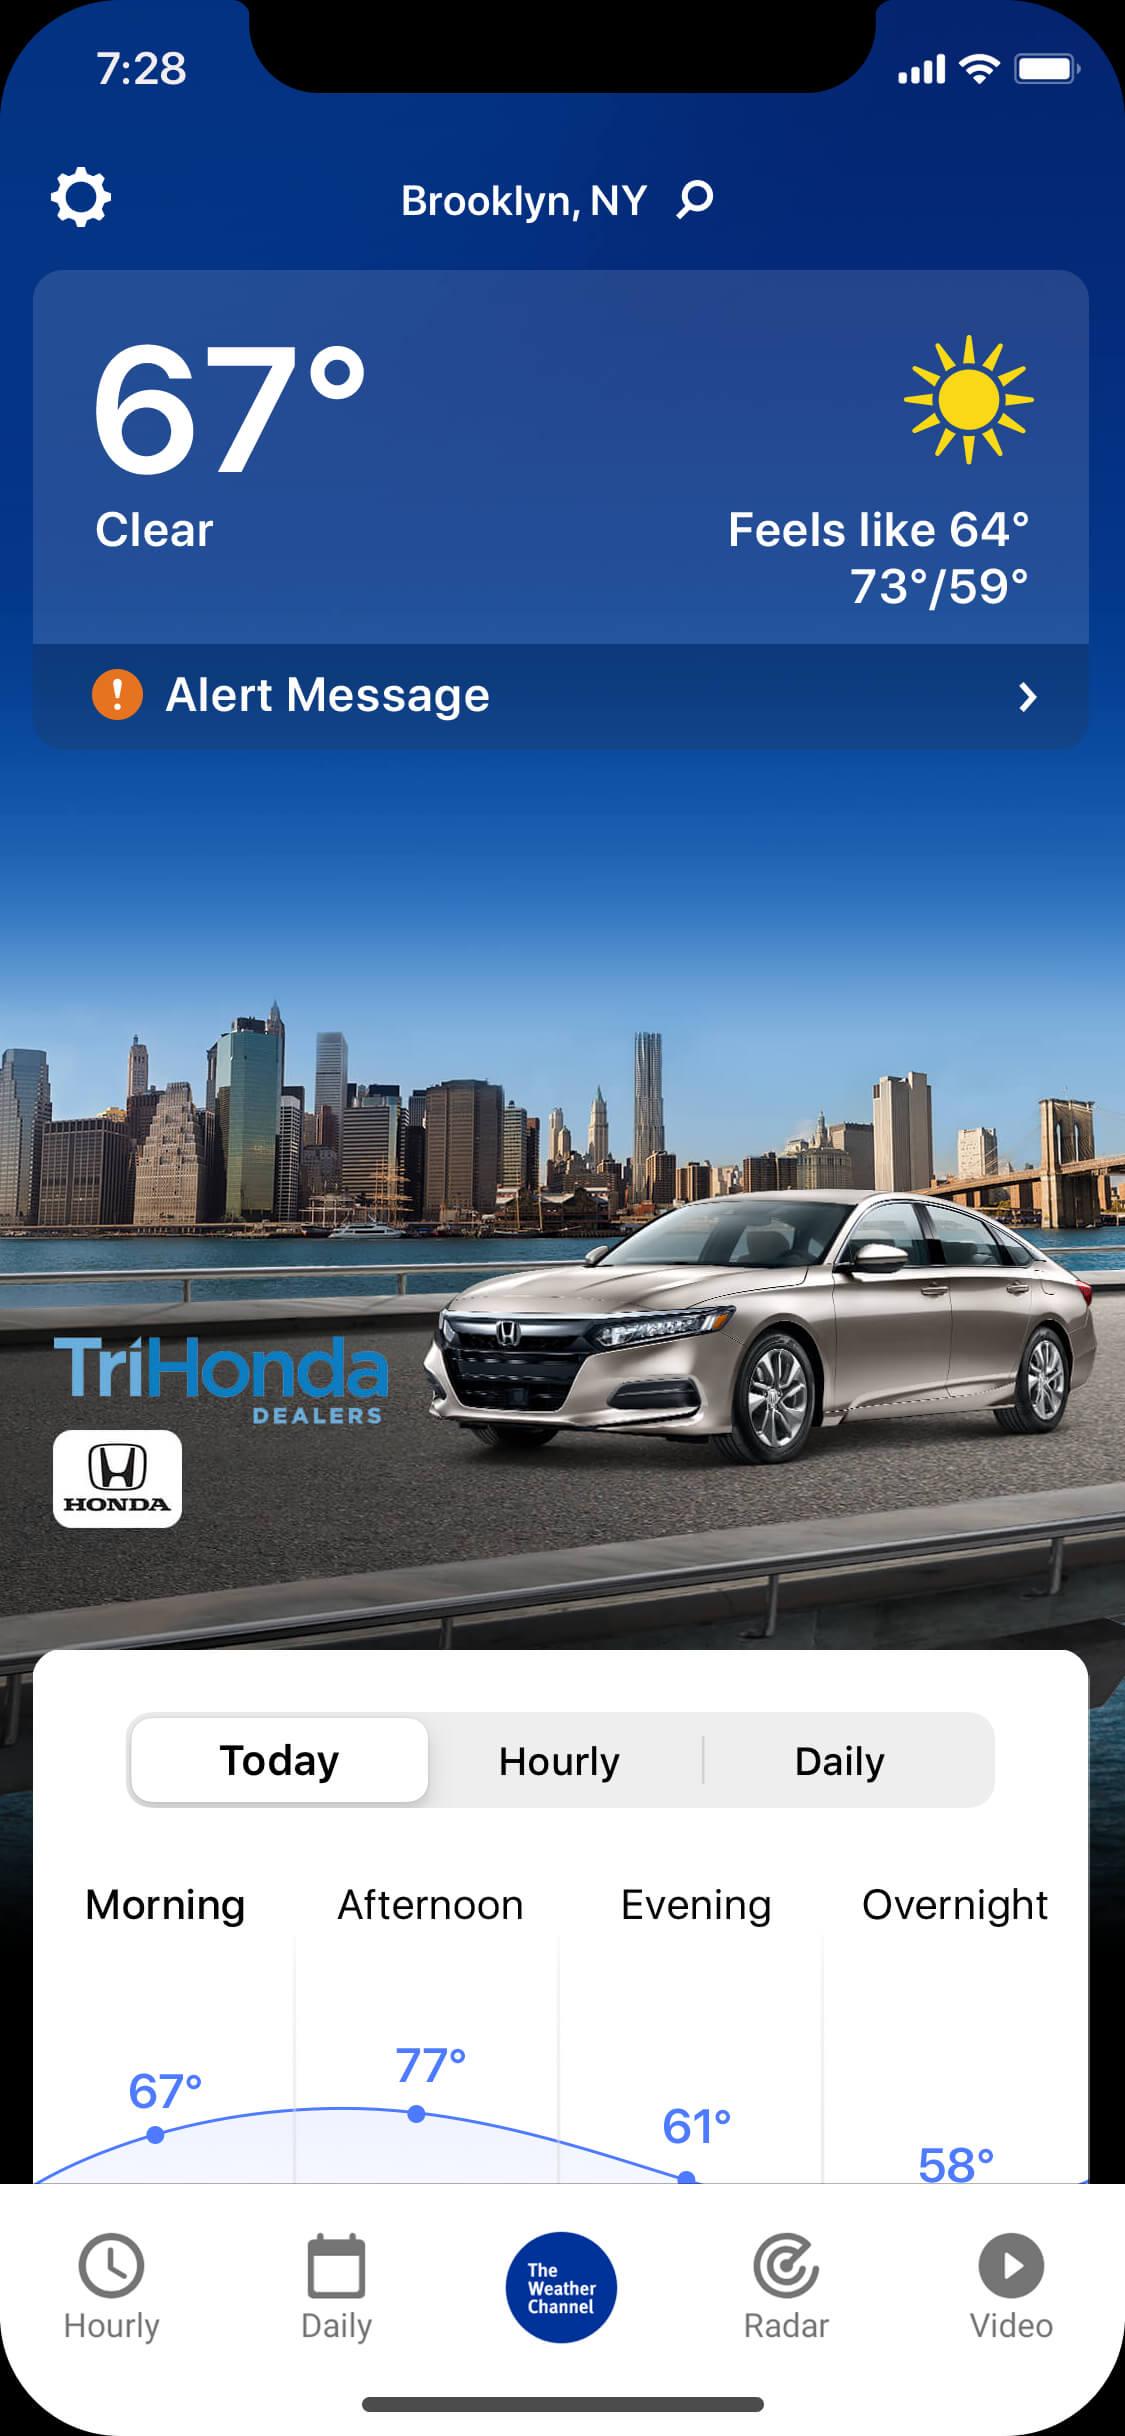 TriHonda_Honda-AWO-Accord-clear_day